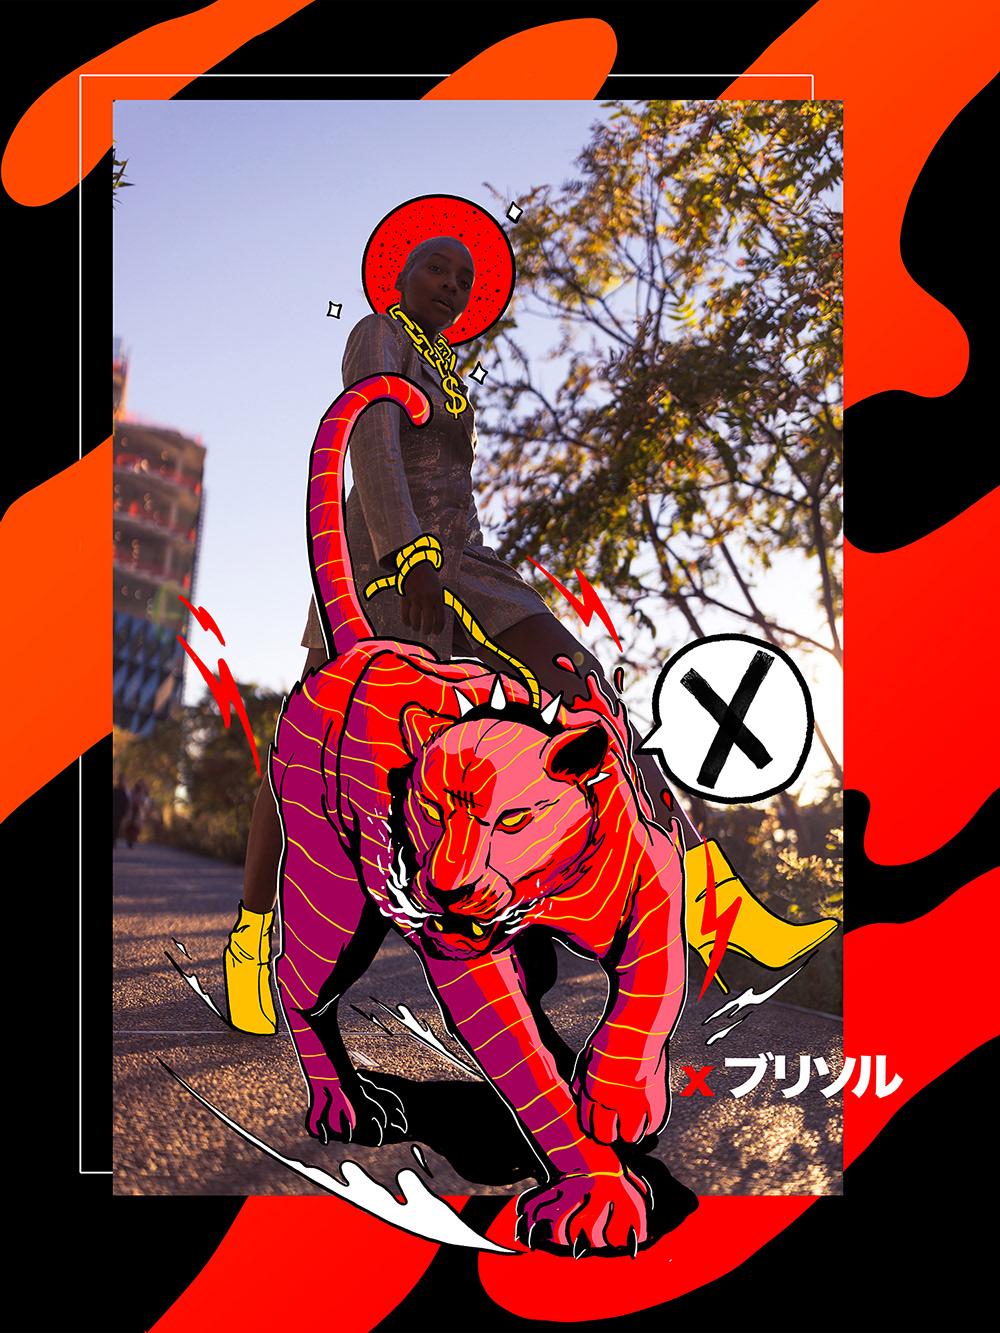 anime collage Digital Art  doodle Fashion  graphic hijack typography